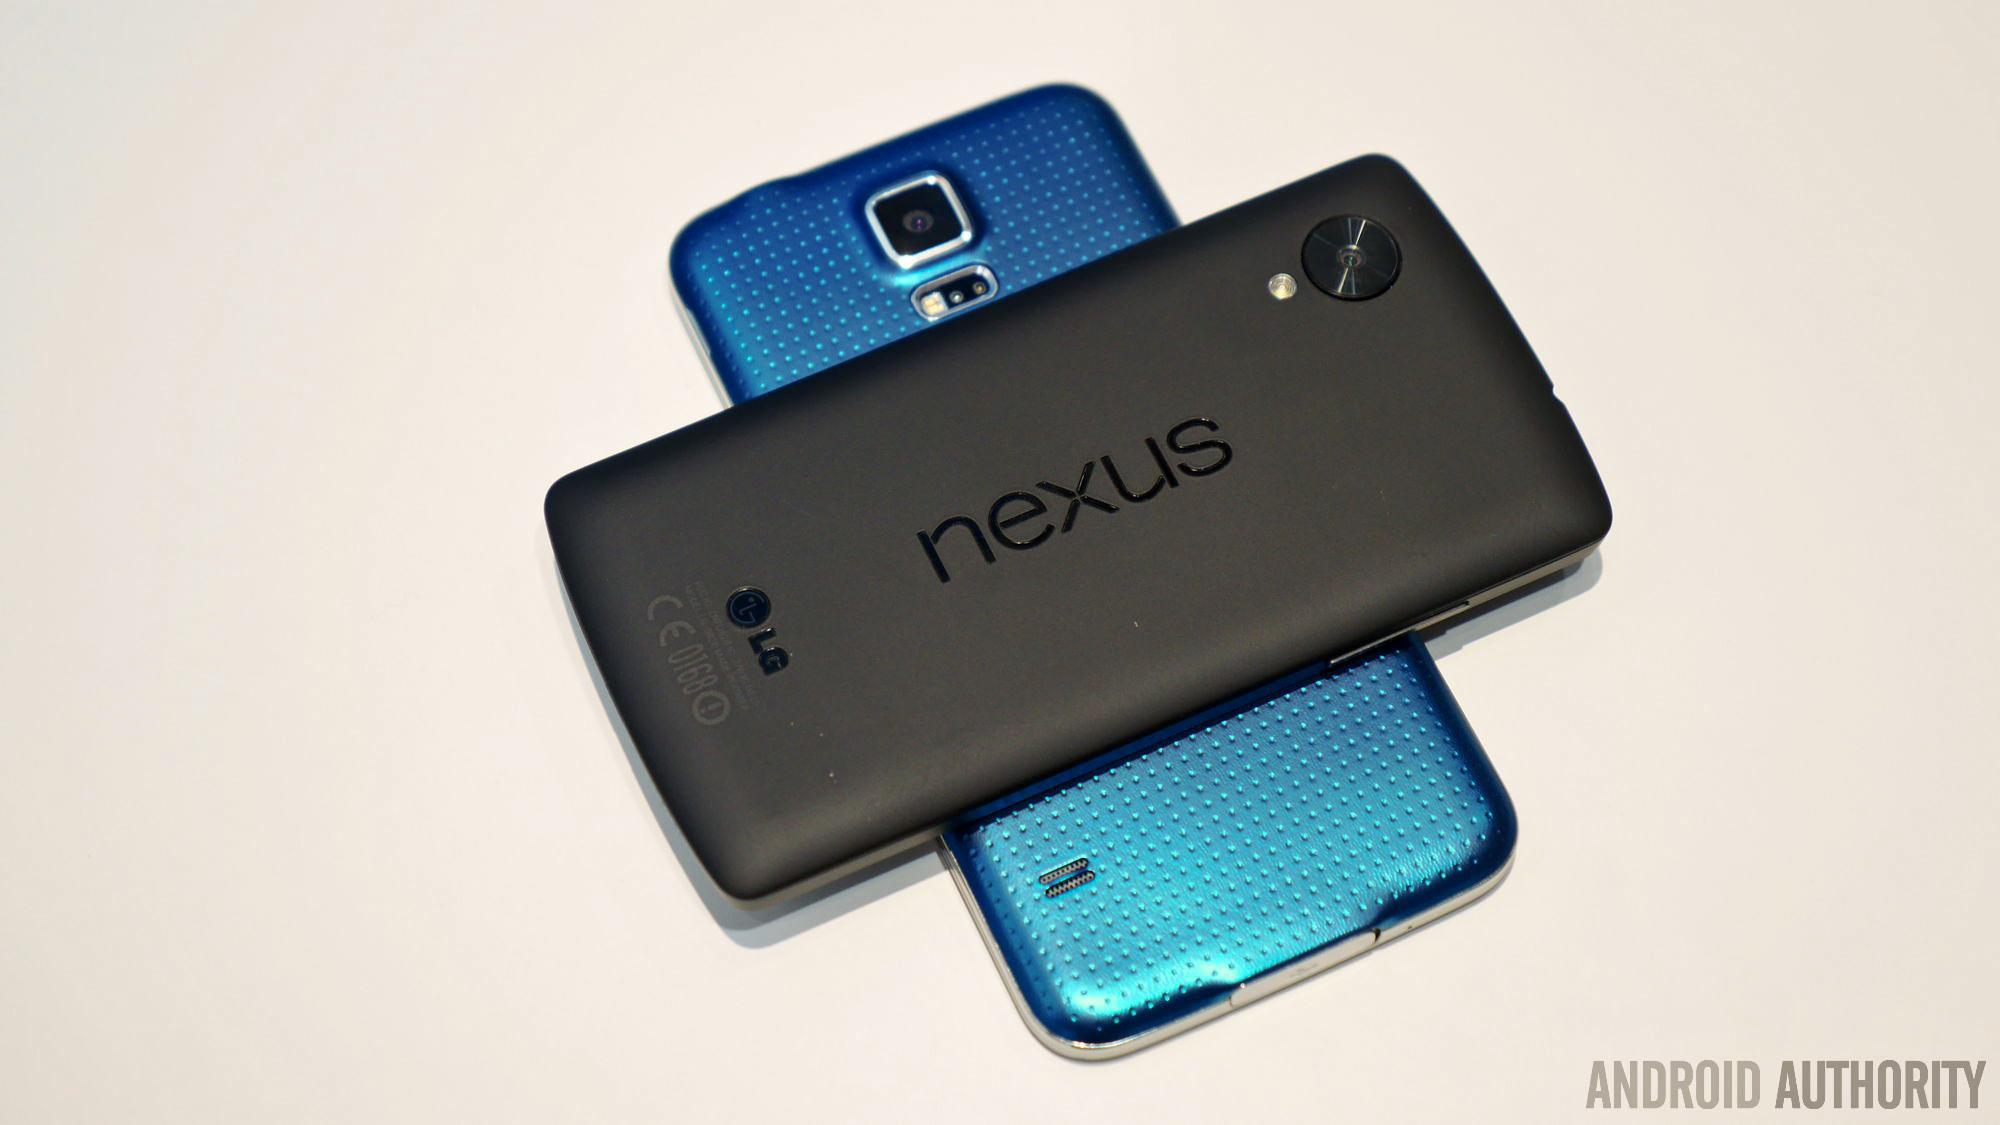 samsung galaxy s5 vs nexus 5 3